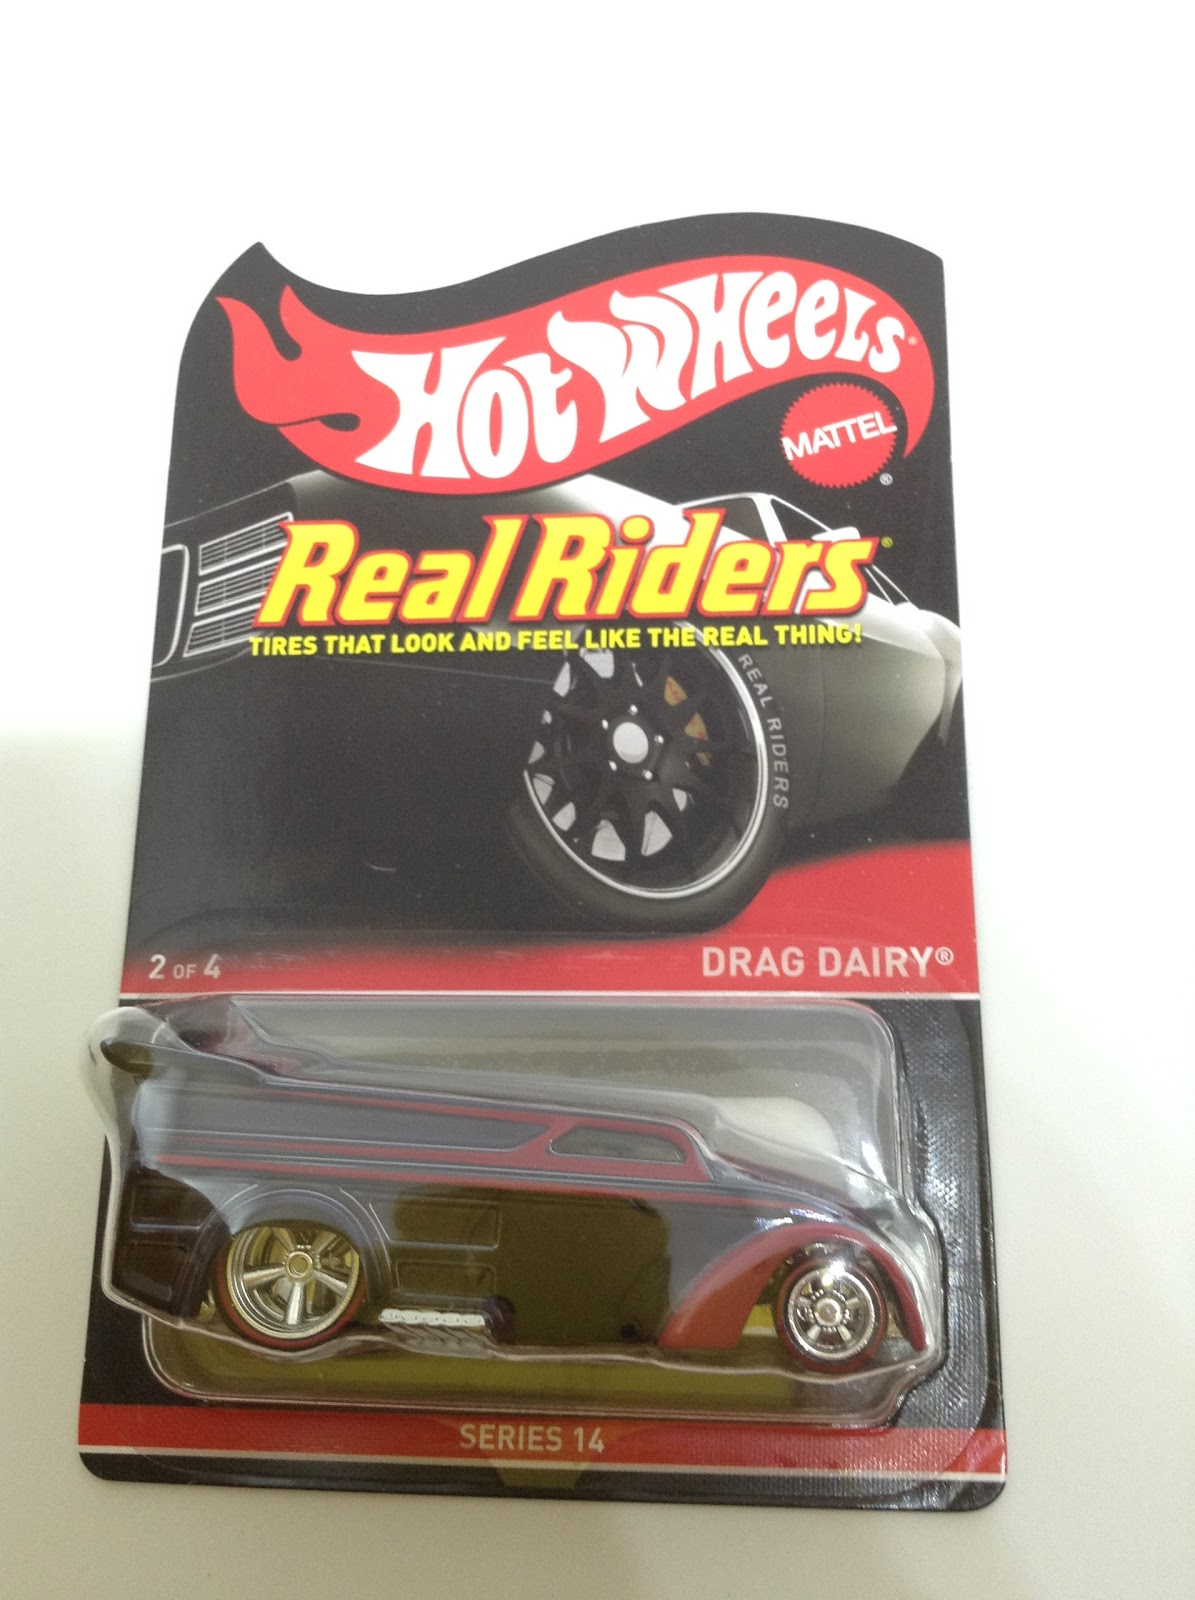 Real Riders RLC Drag Dairy 2017 Hot Wheels Series 14